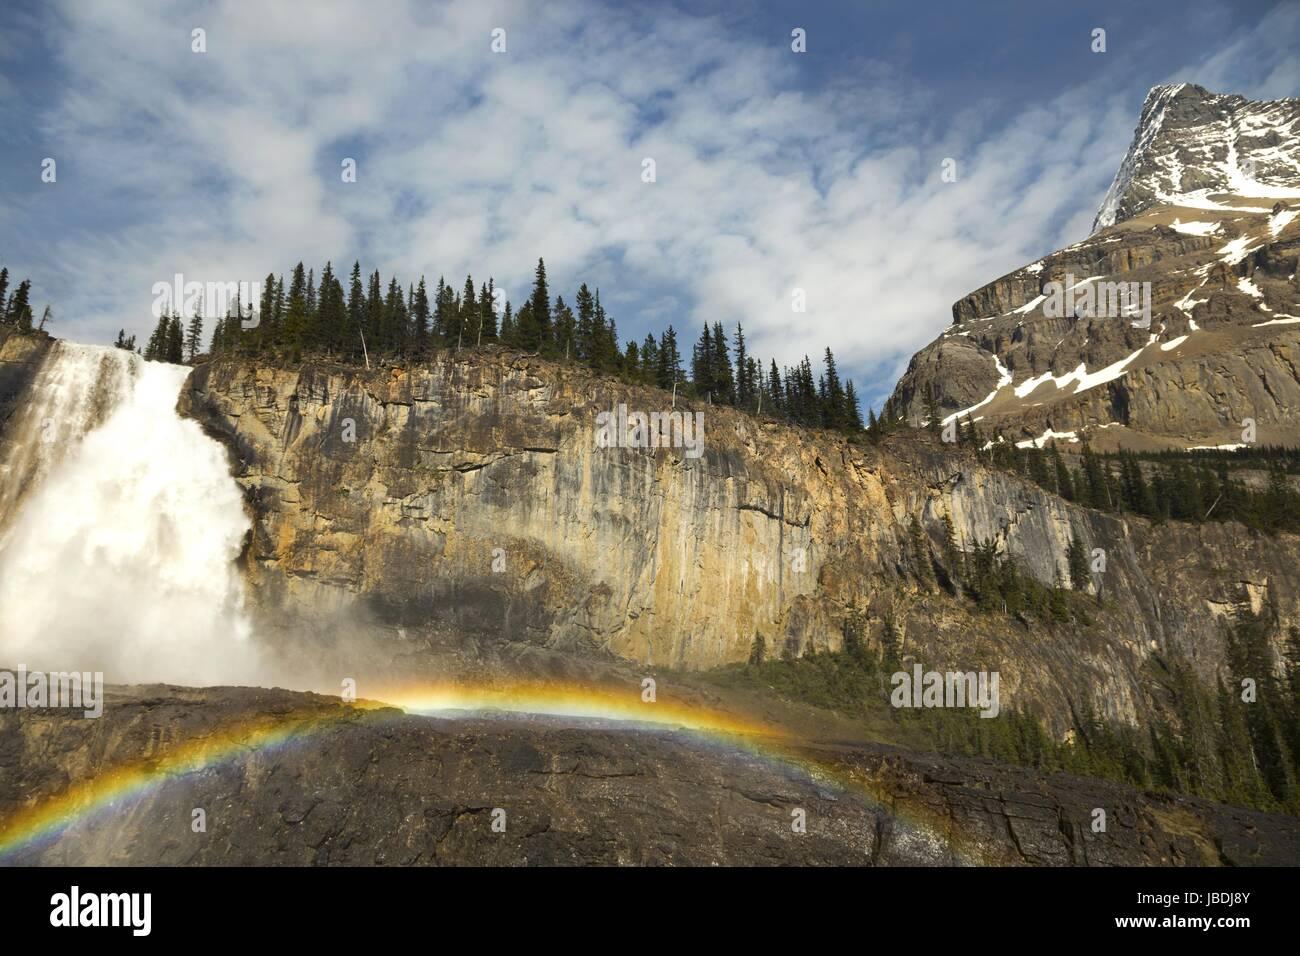 Emperor Falls Berg Lake Hiking Trail Mount Robson Rocky Mountains British Columbia Canada - Stock Image